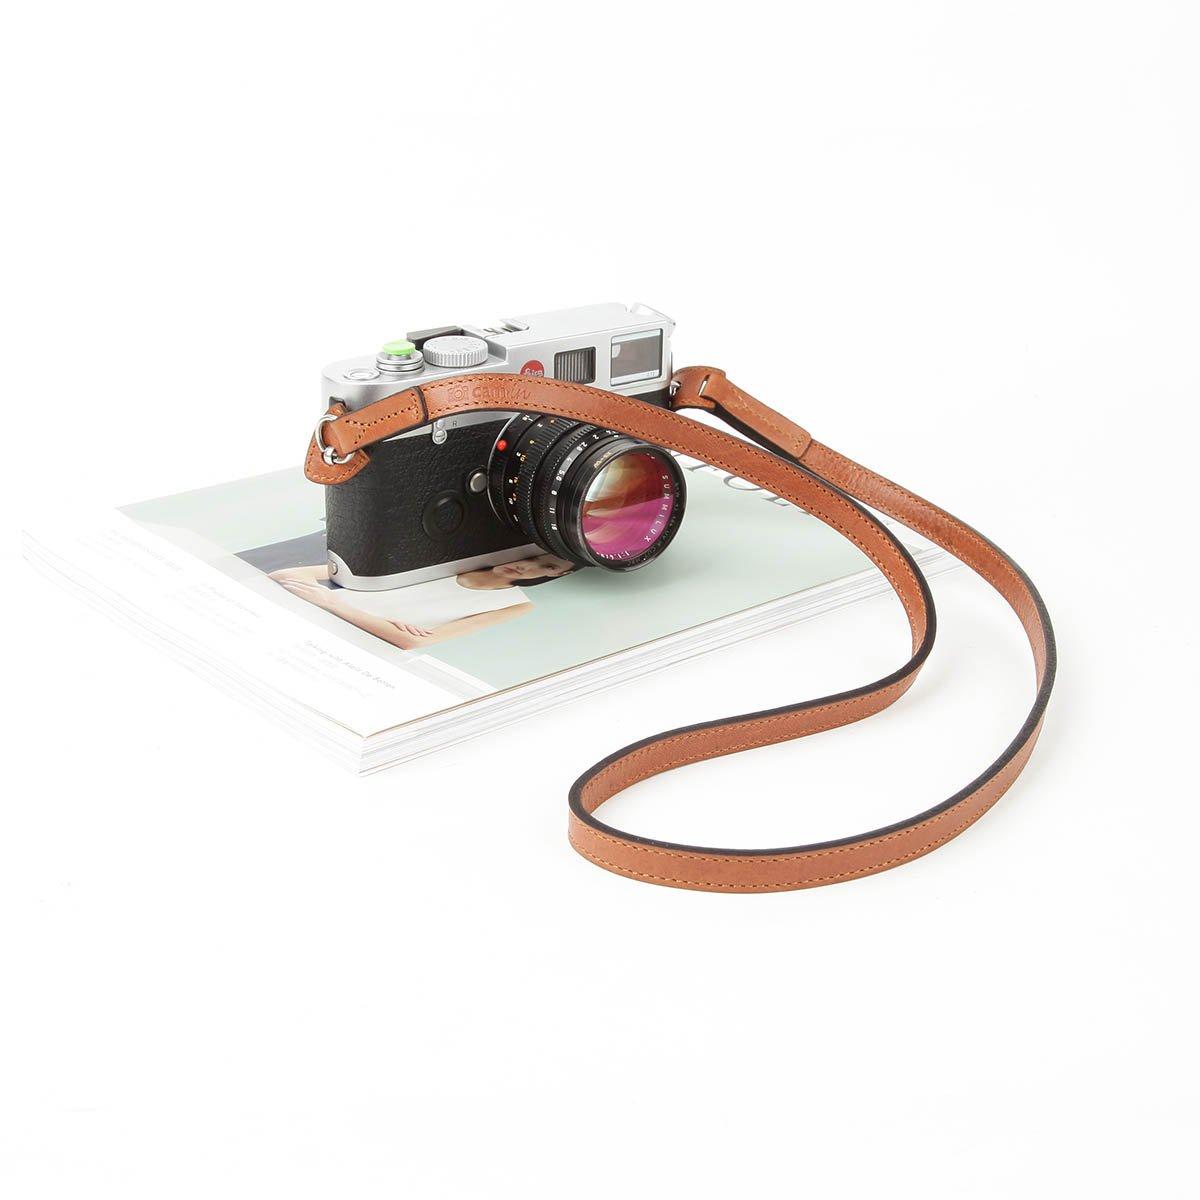 cam-inイタリア牛皮ショルダーネックカメラストラップfor Leica/Nikon / Sony/Fujifilm B07FBZHR3S